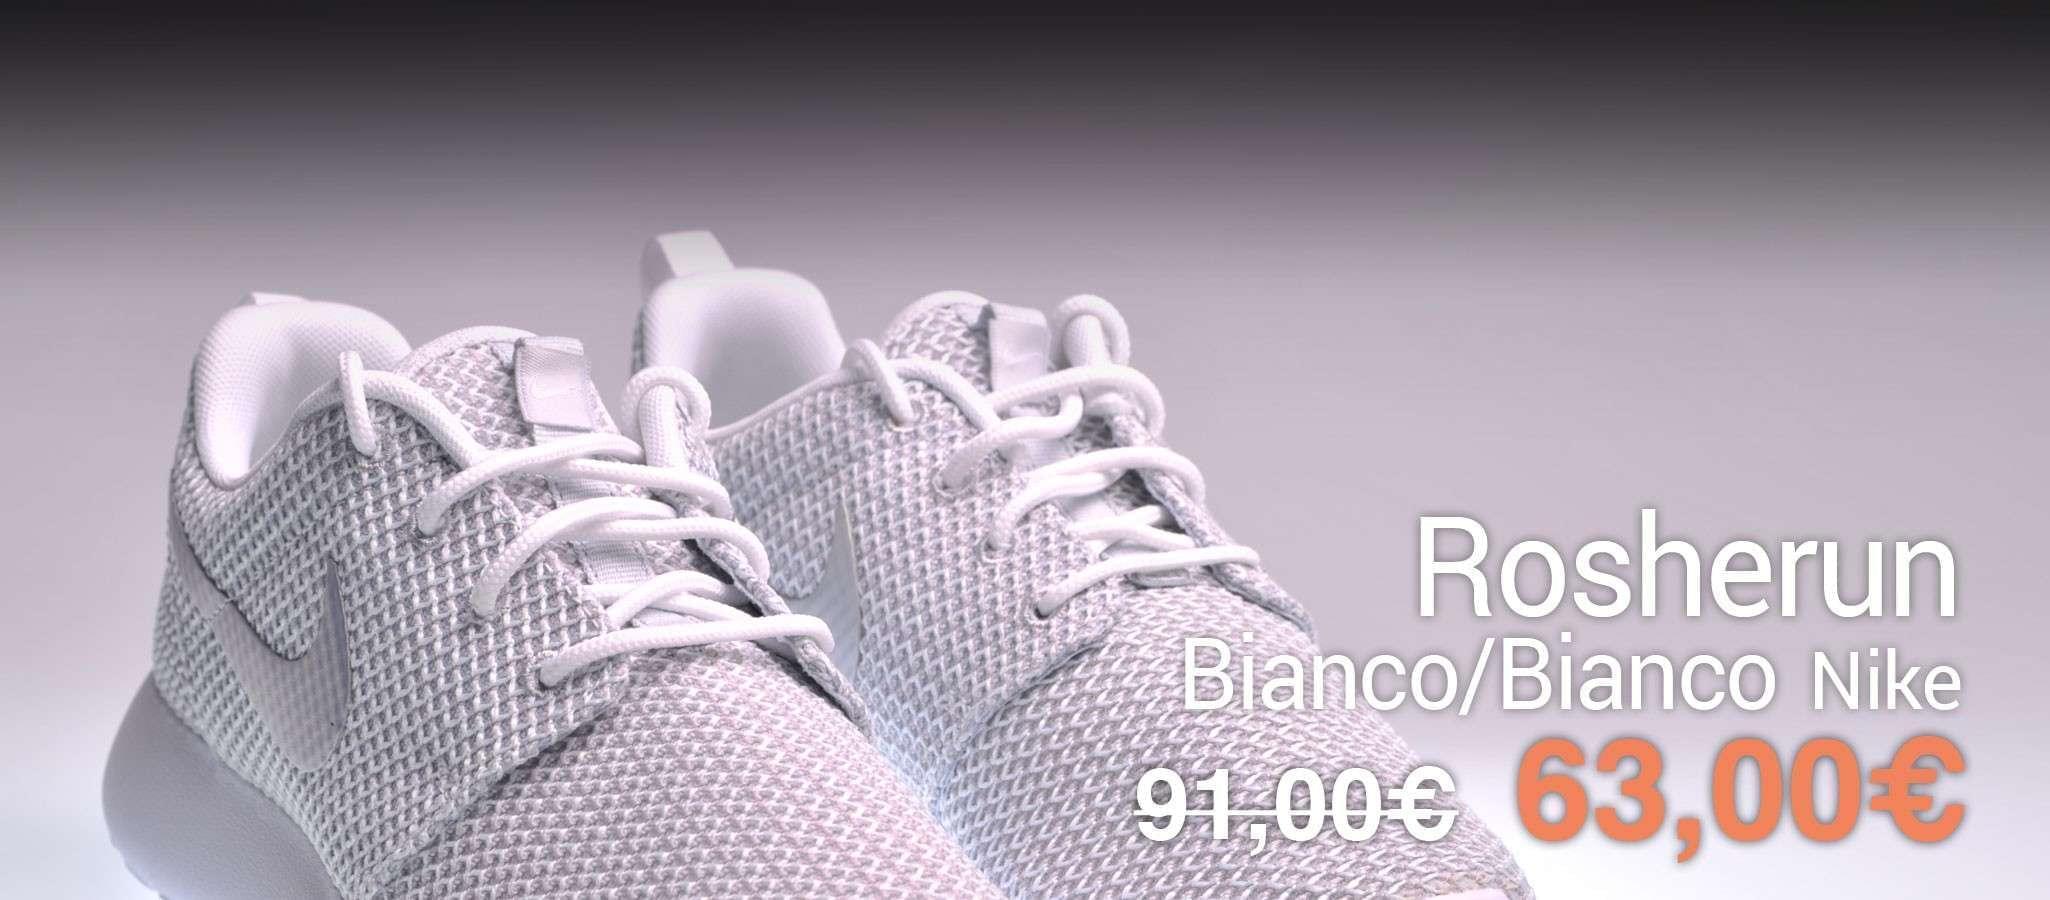 Nike Rosherun Bianco/Bianco